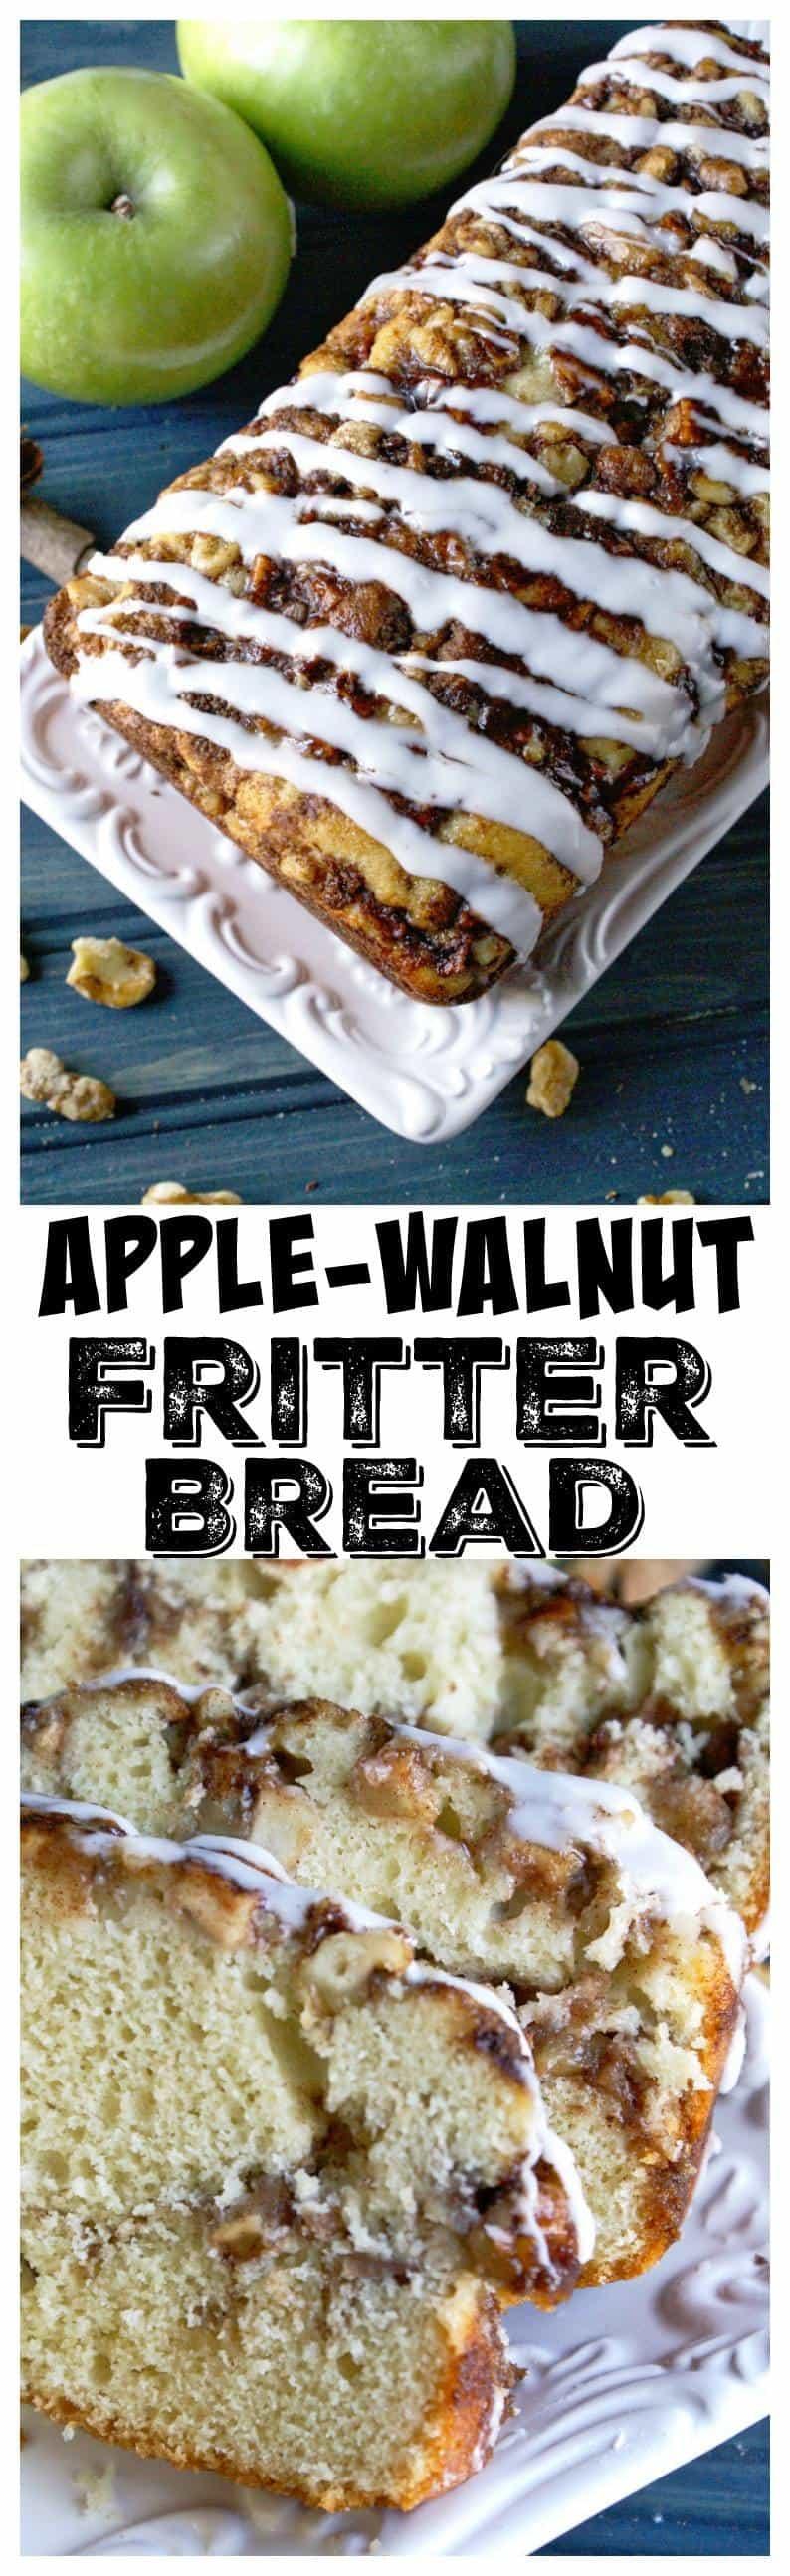 Apple-walnut fritter bread